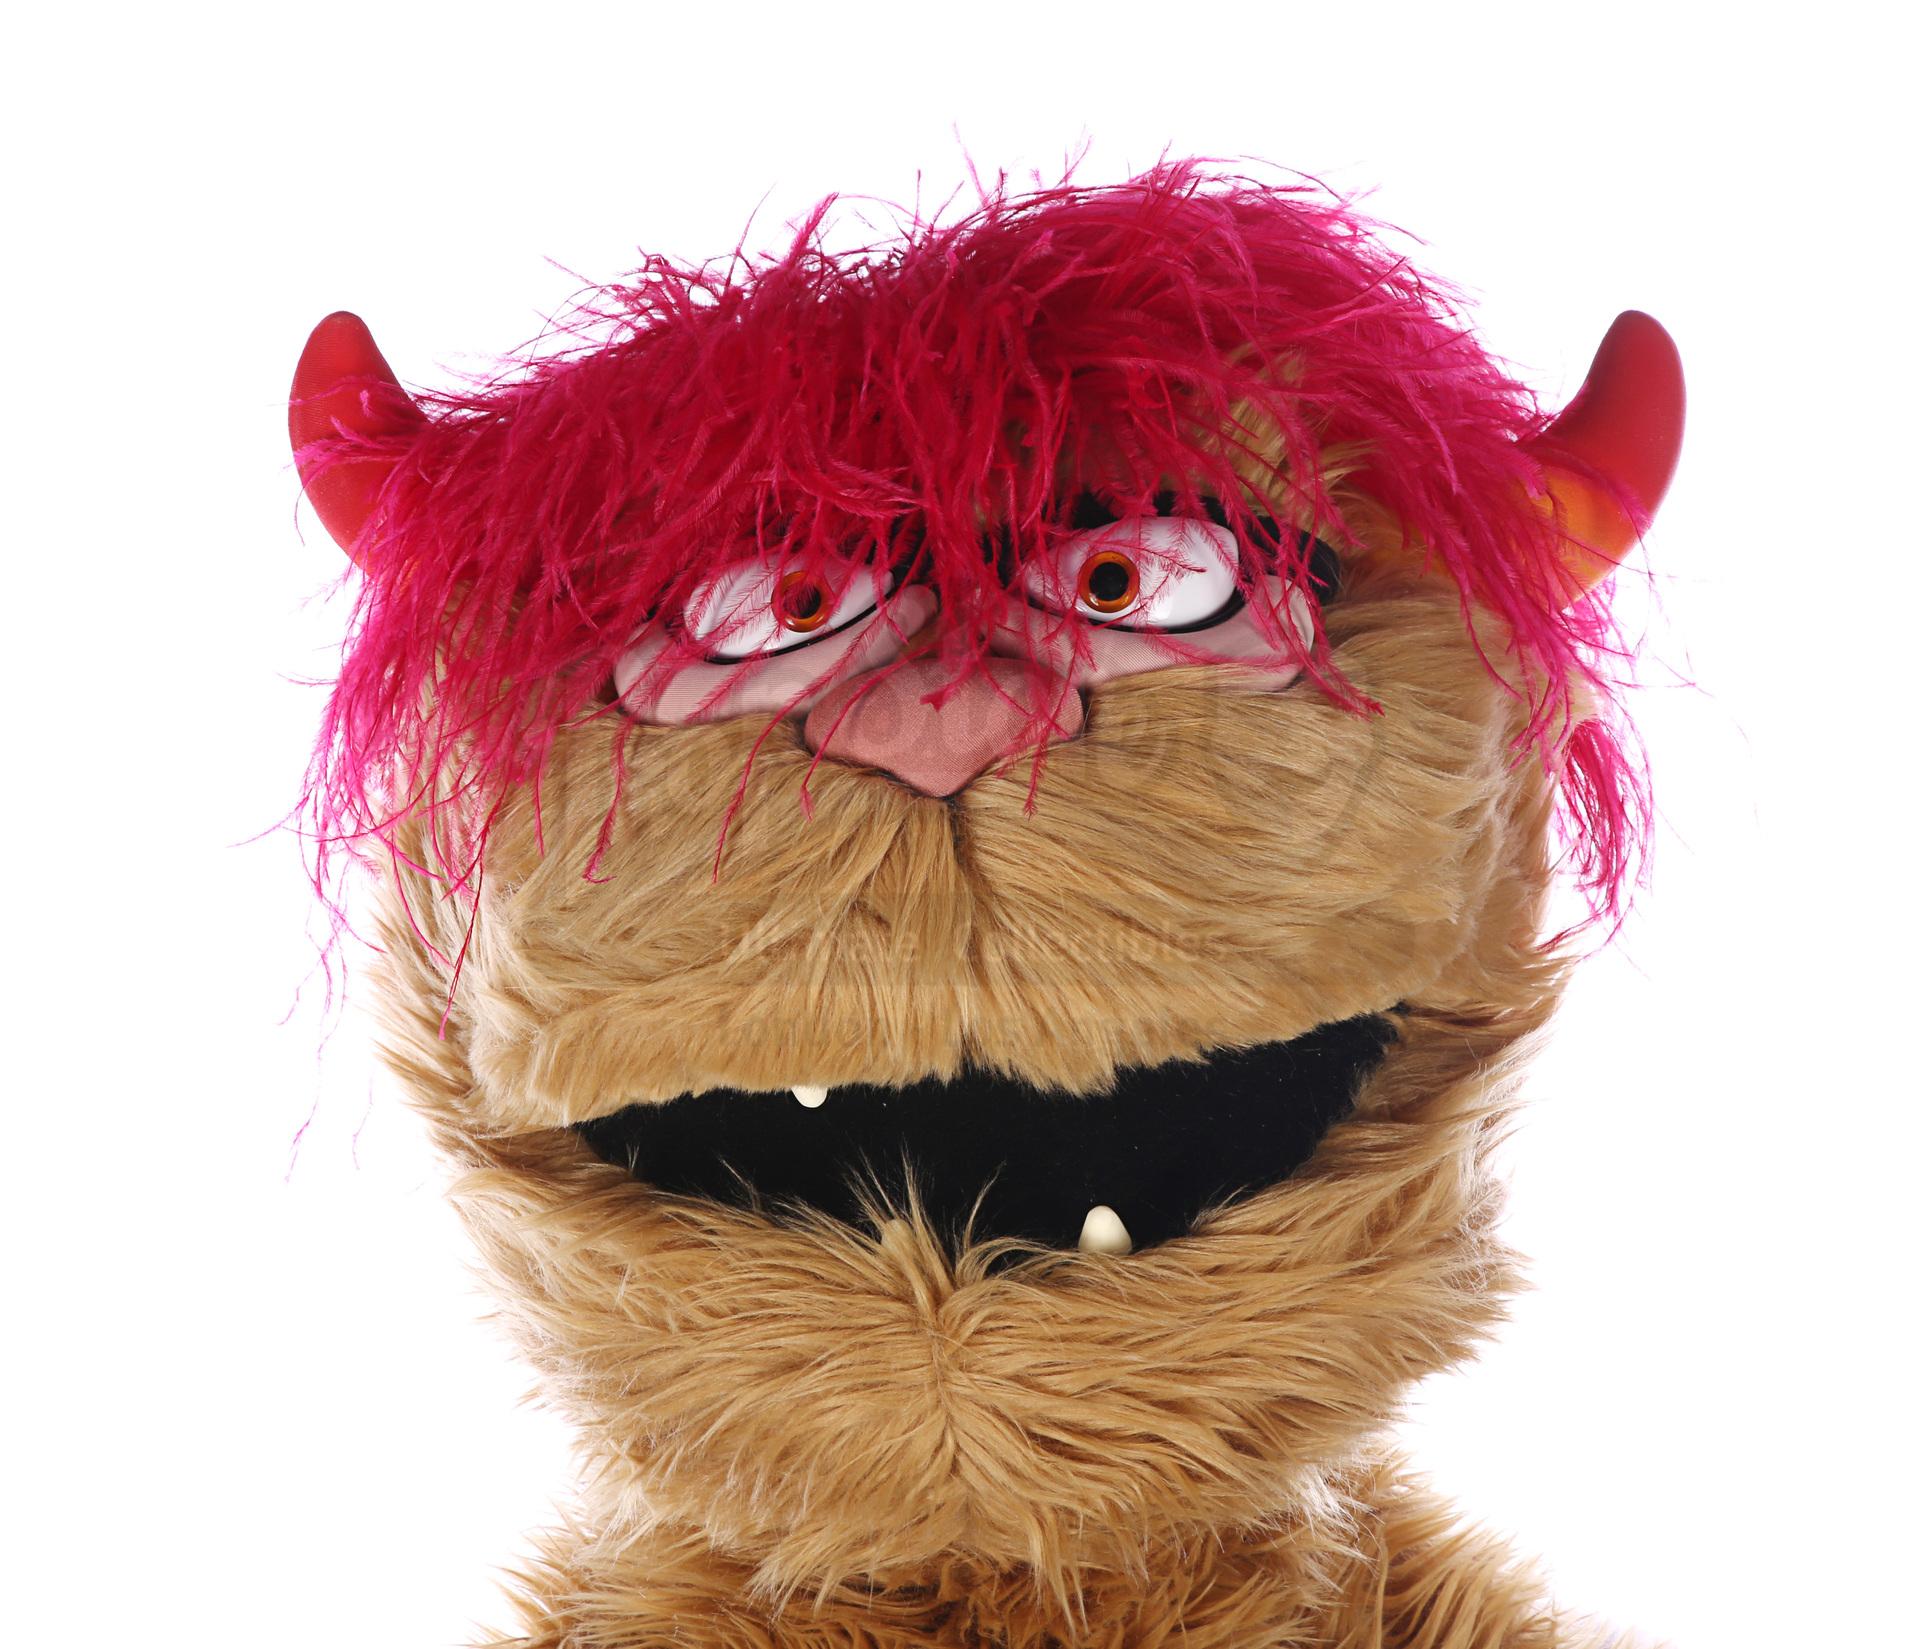 AVENUE Q (STAGE SHOW) - Trekkie Monster Puppet - Image 3 of 5